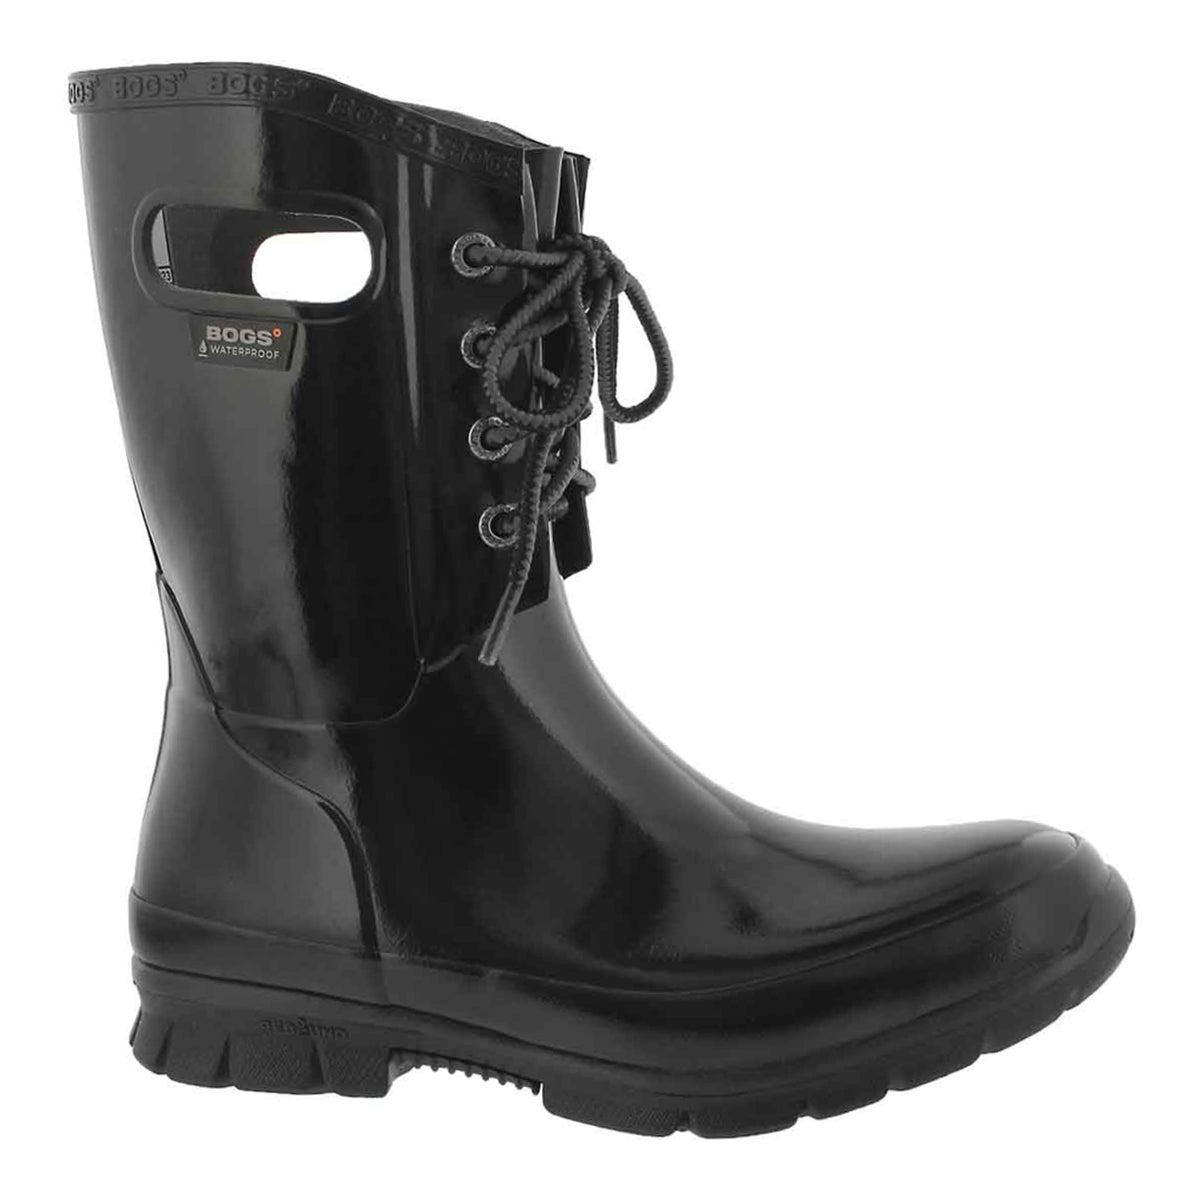 Women's AMANDA 4-EYE black waterproof rain boots